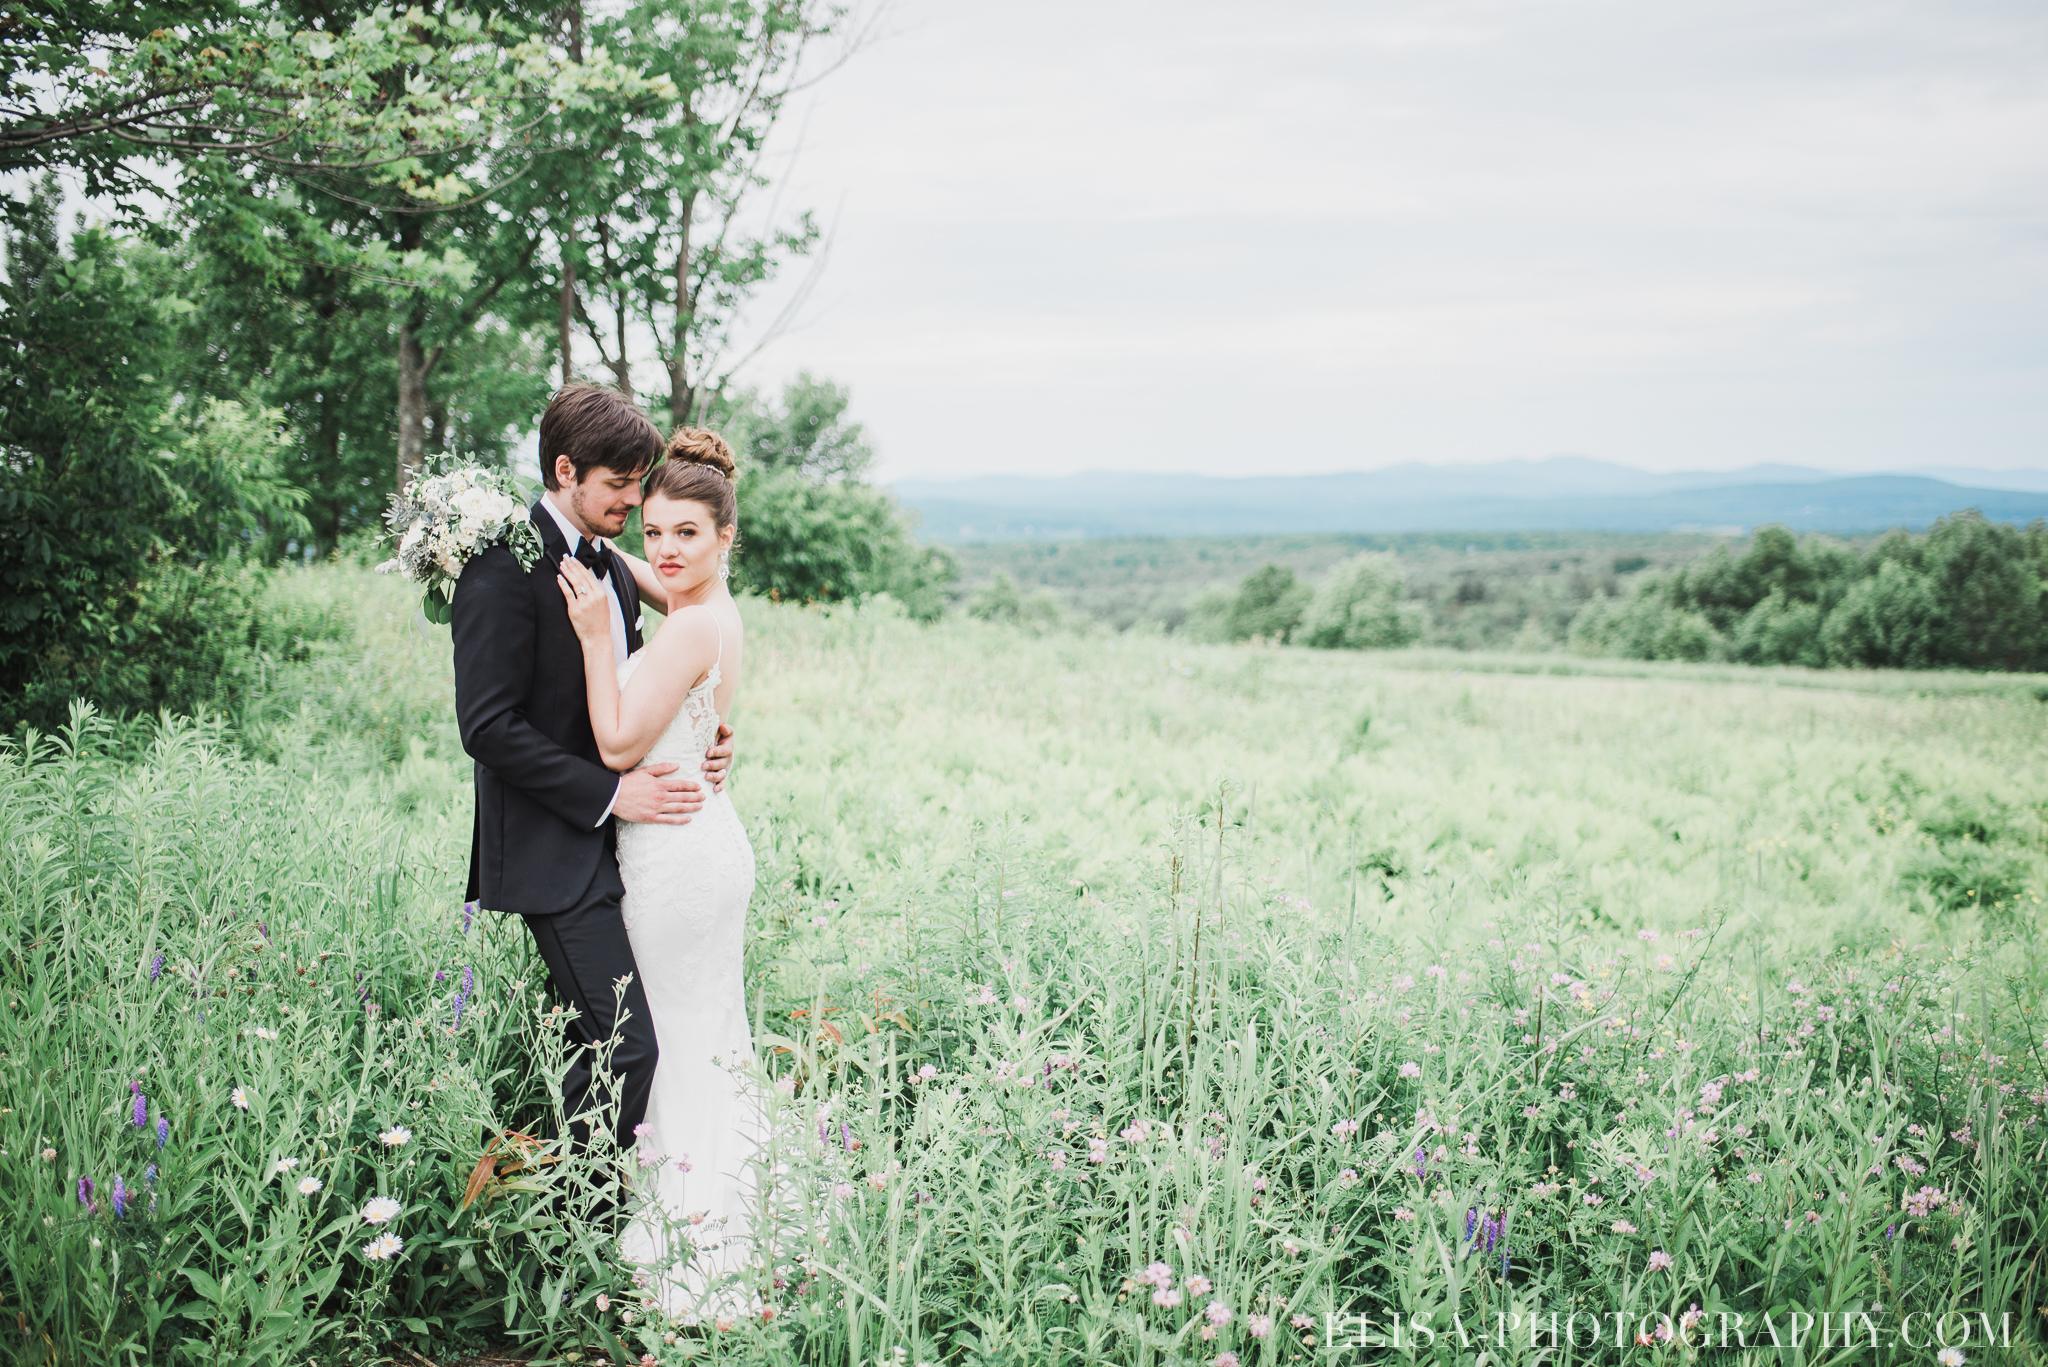 photo mariage a la montagne domaine tomali maniatin portrait couple lifestyle naturel lumineux professionel 6267 - Mariage à la montagne au domaine Tomali-Maniatyn